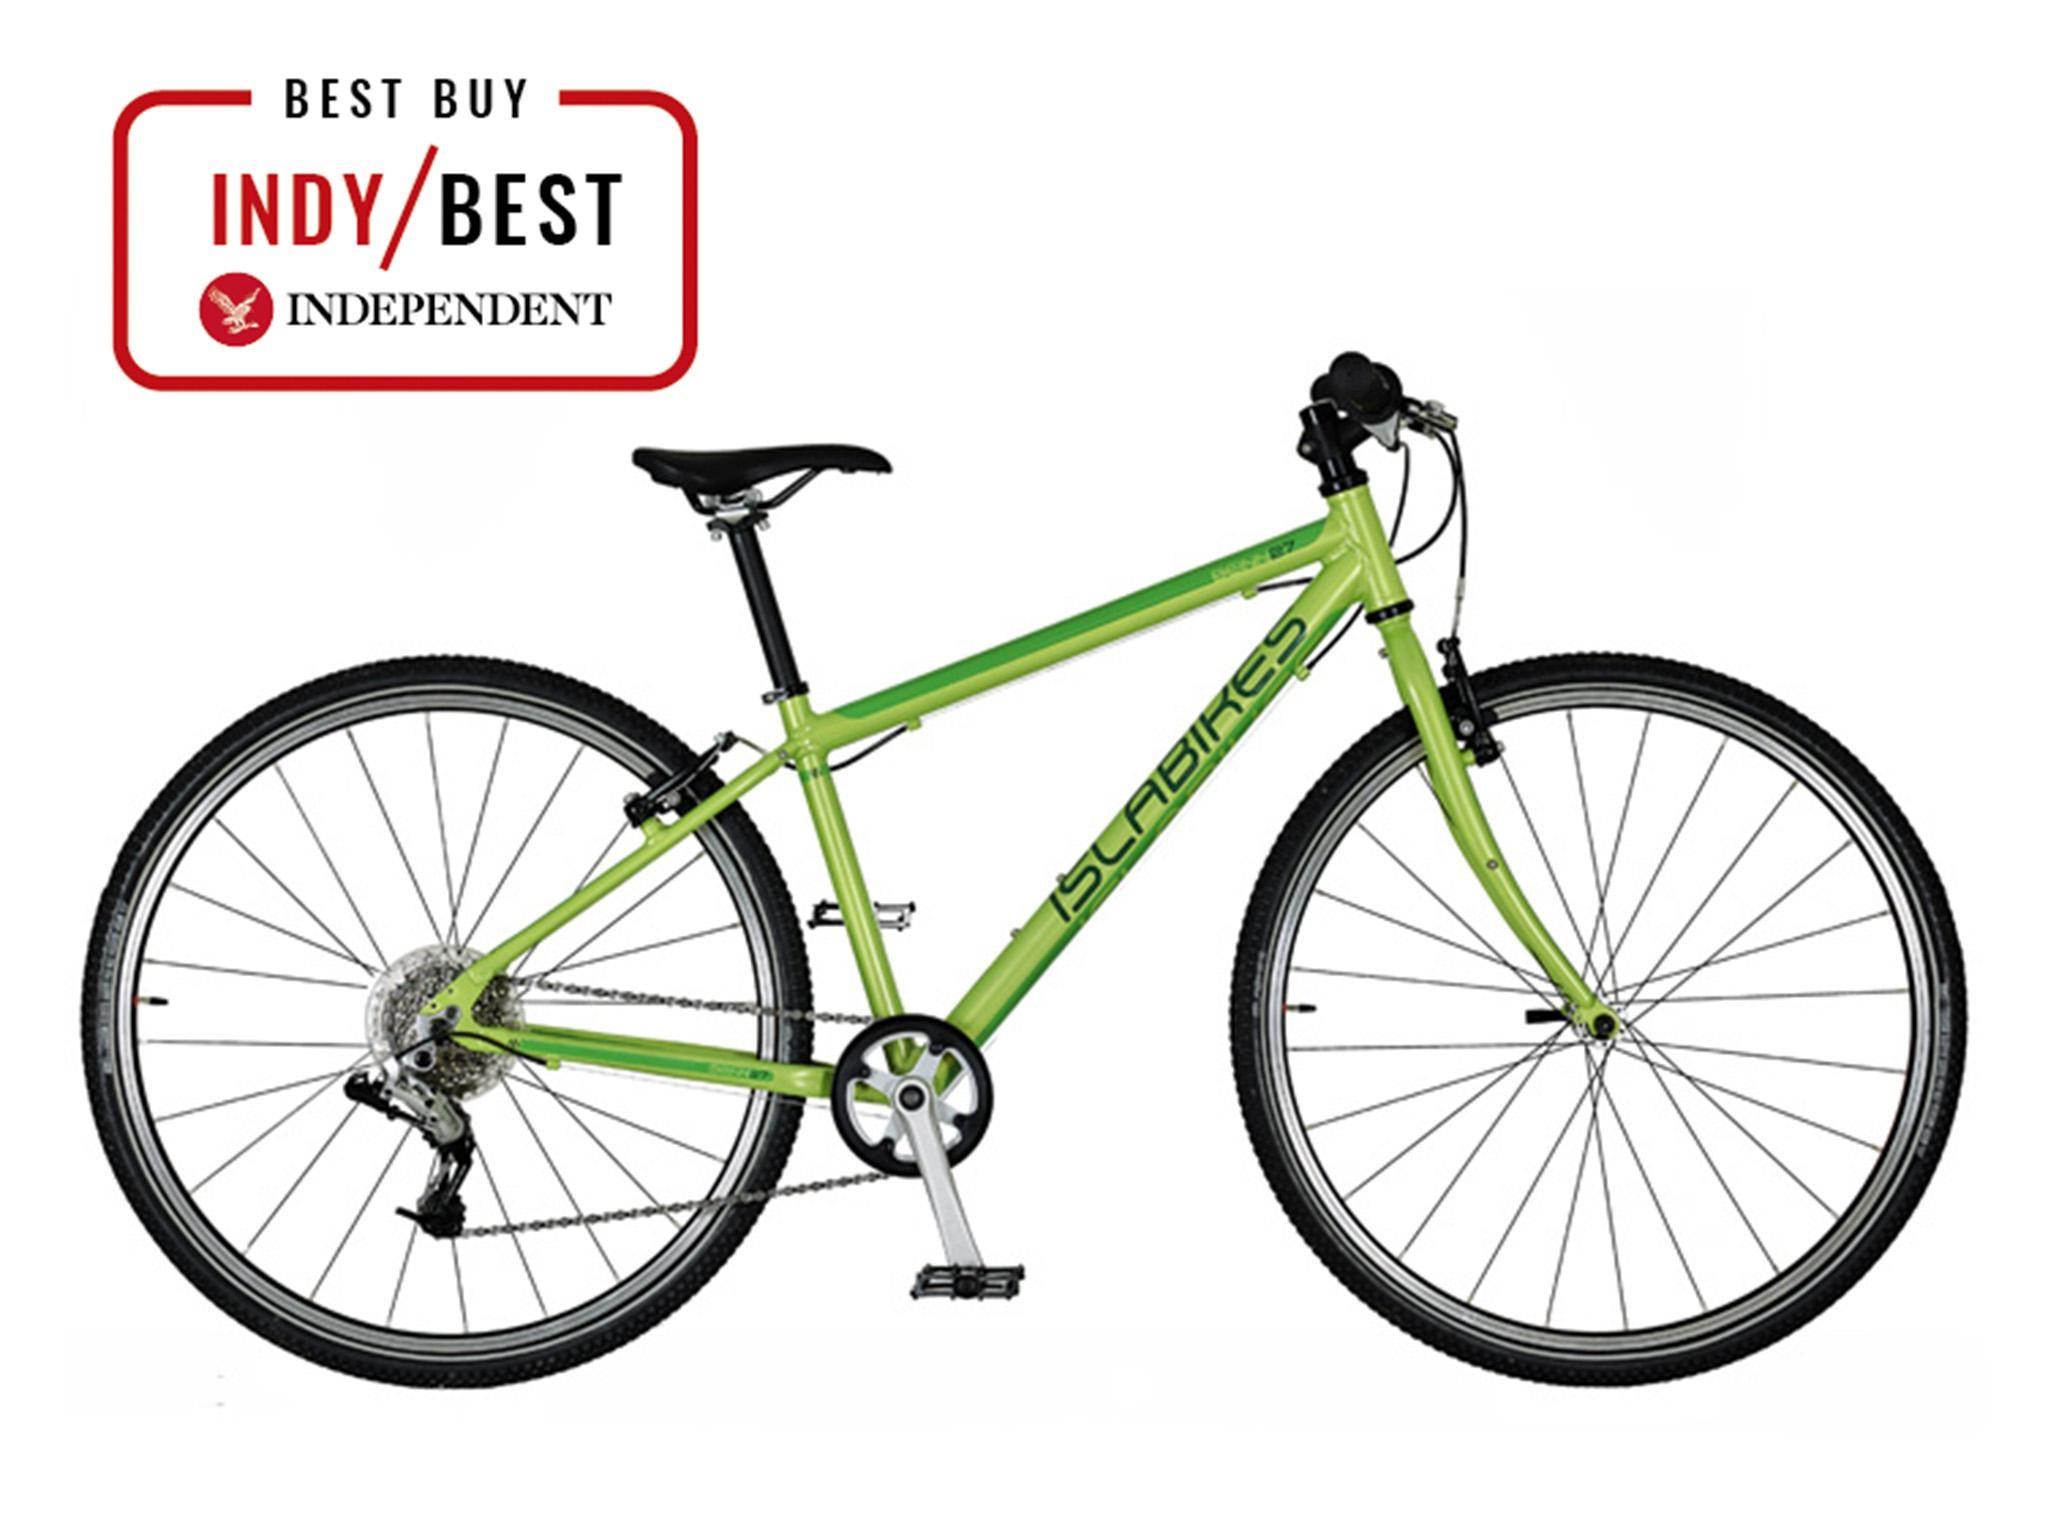 9f381776cad0 11 best kids bikes | The Independent